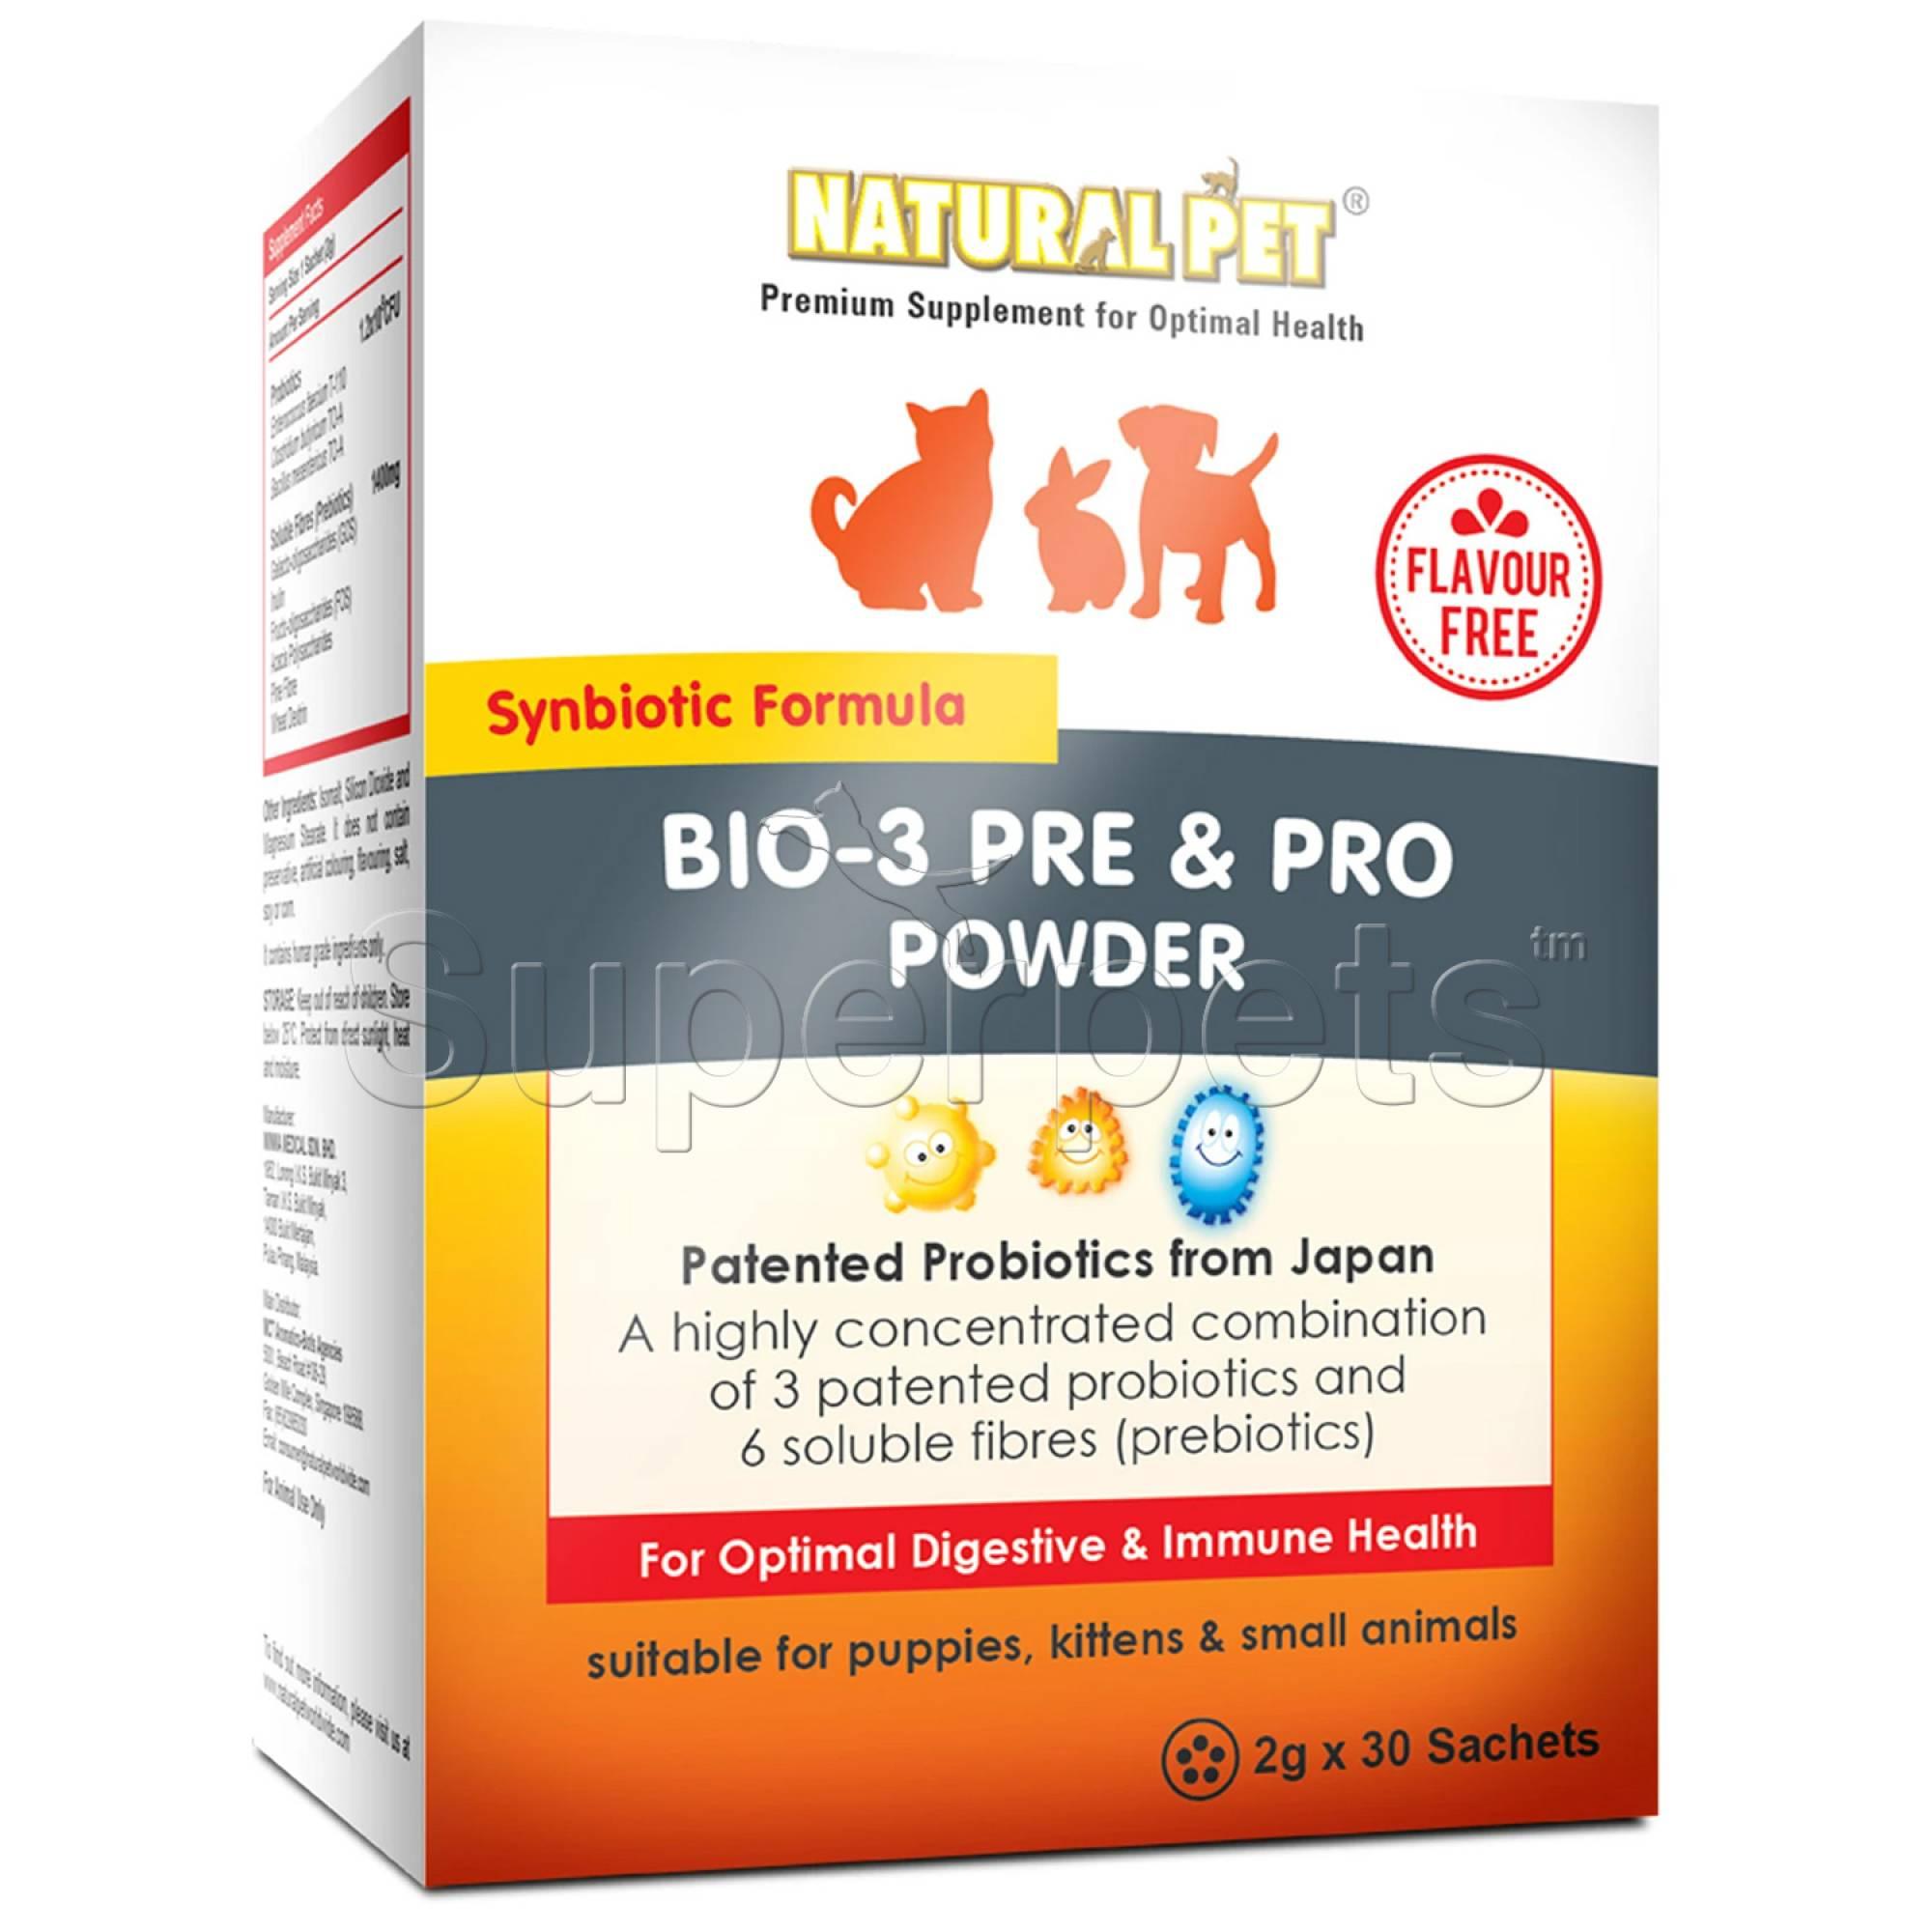 Natural Pet - Bio-3 Pre & Pro Powder (Flavour Free) - 2g x 30 Sachets